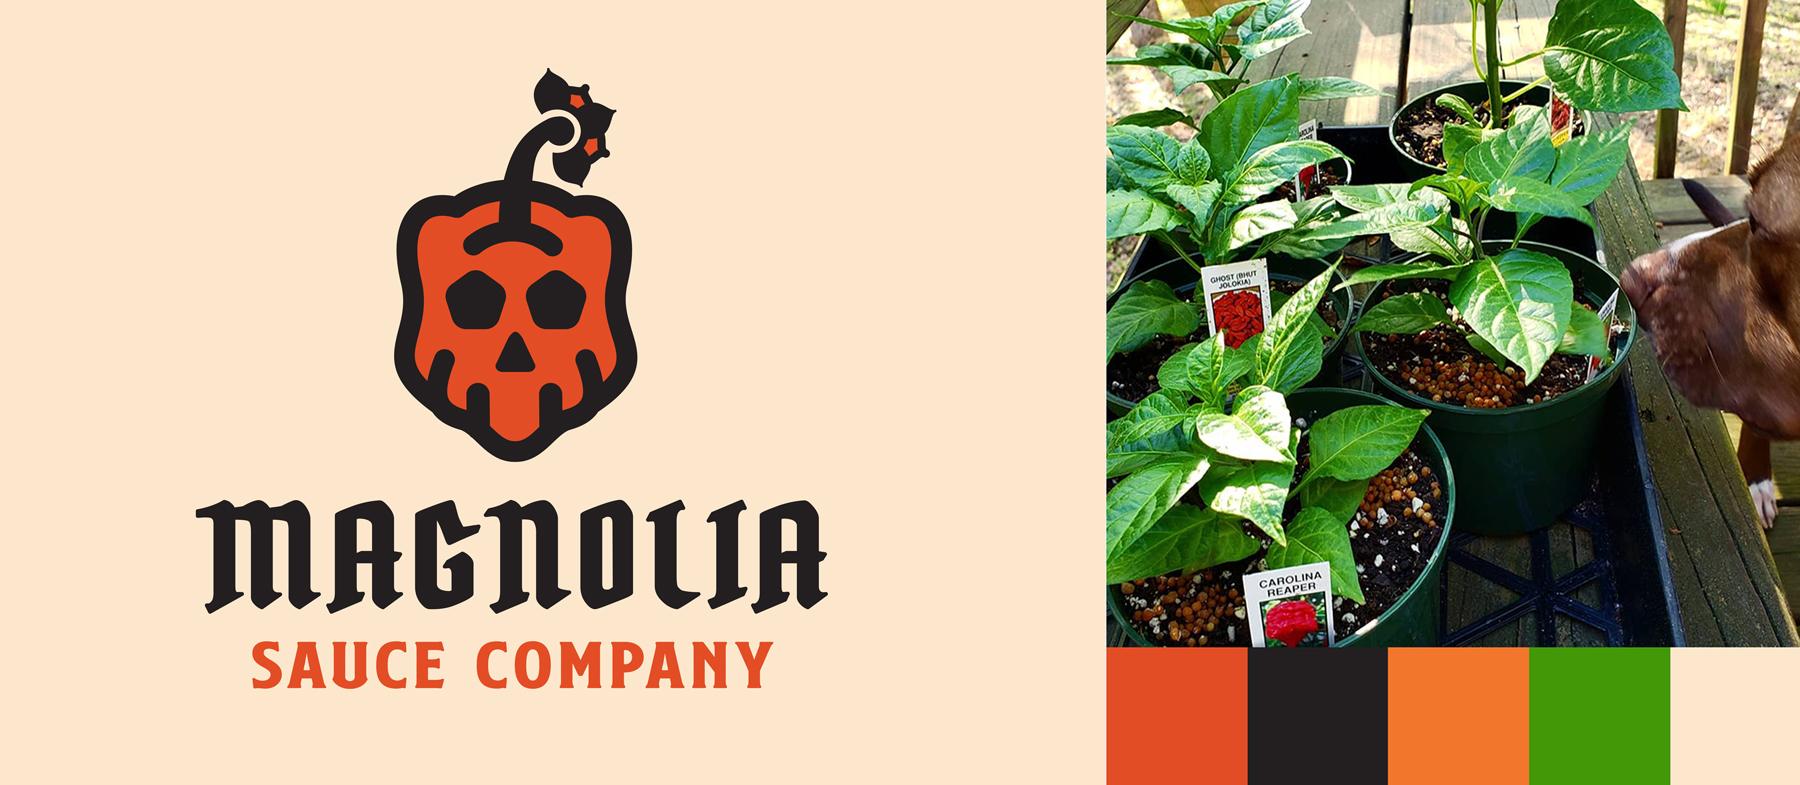 Magnolia Sauce Company Maiocco Design Co.